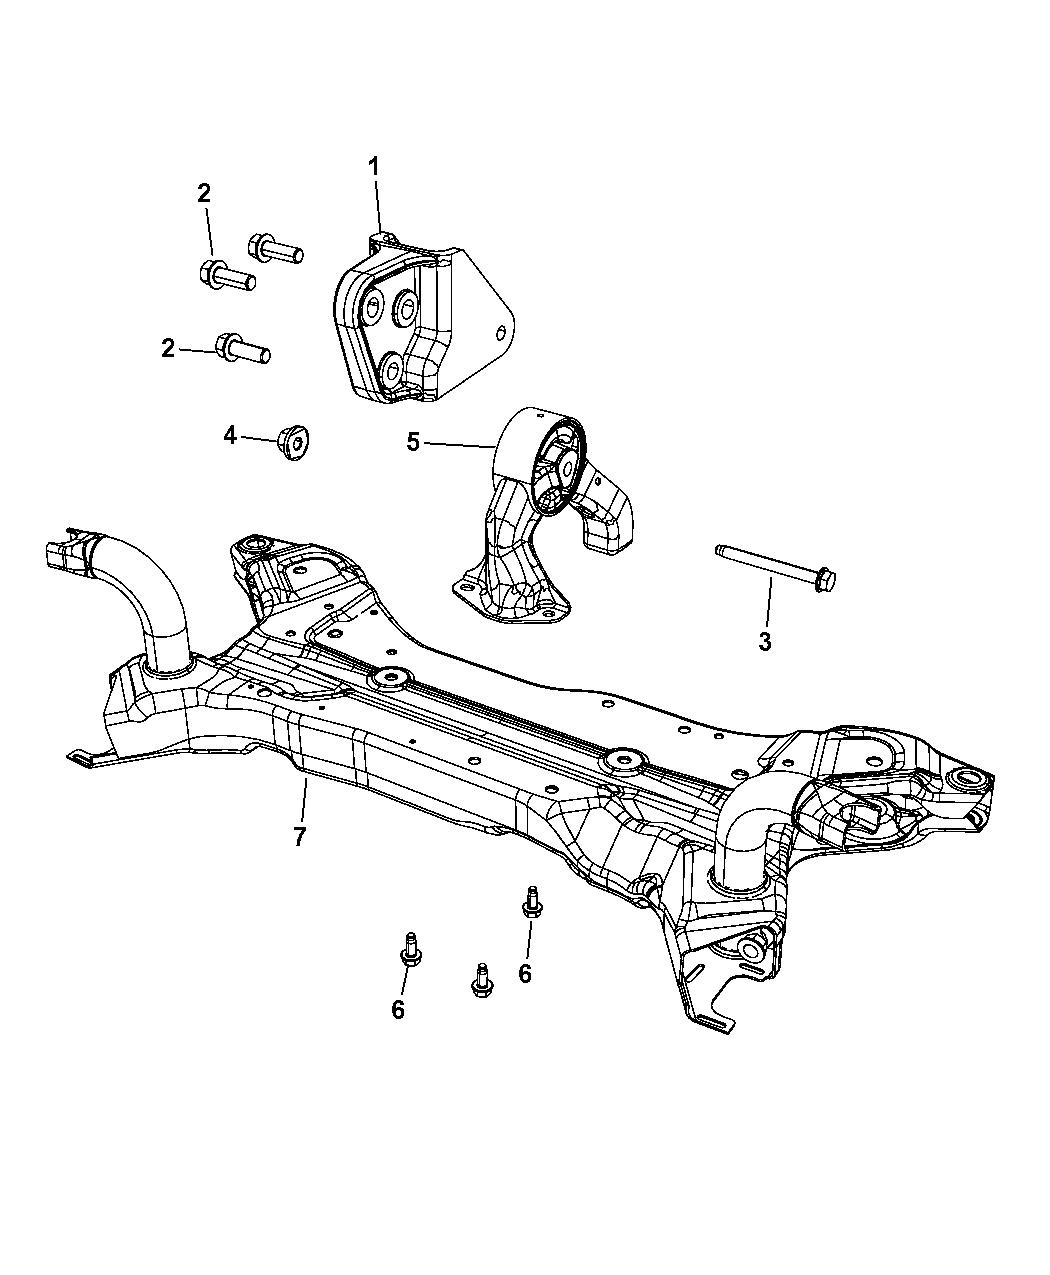 2013 Jeep Compass Engine Mounting Rear Mopar Parts Giant Diagram Thumbnail 1